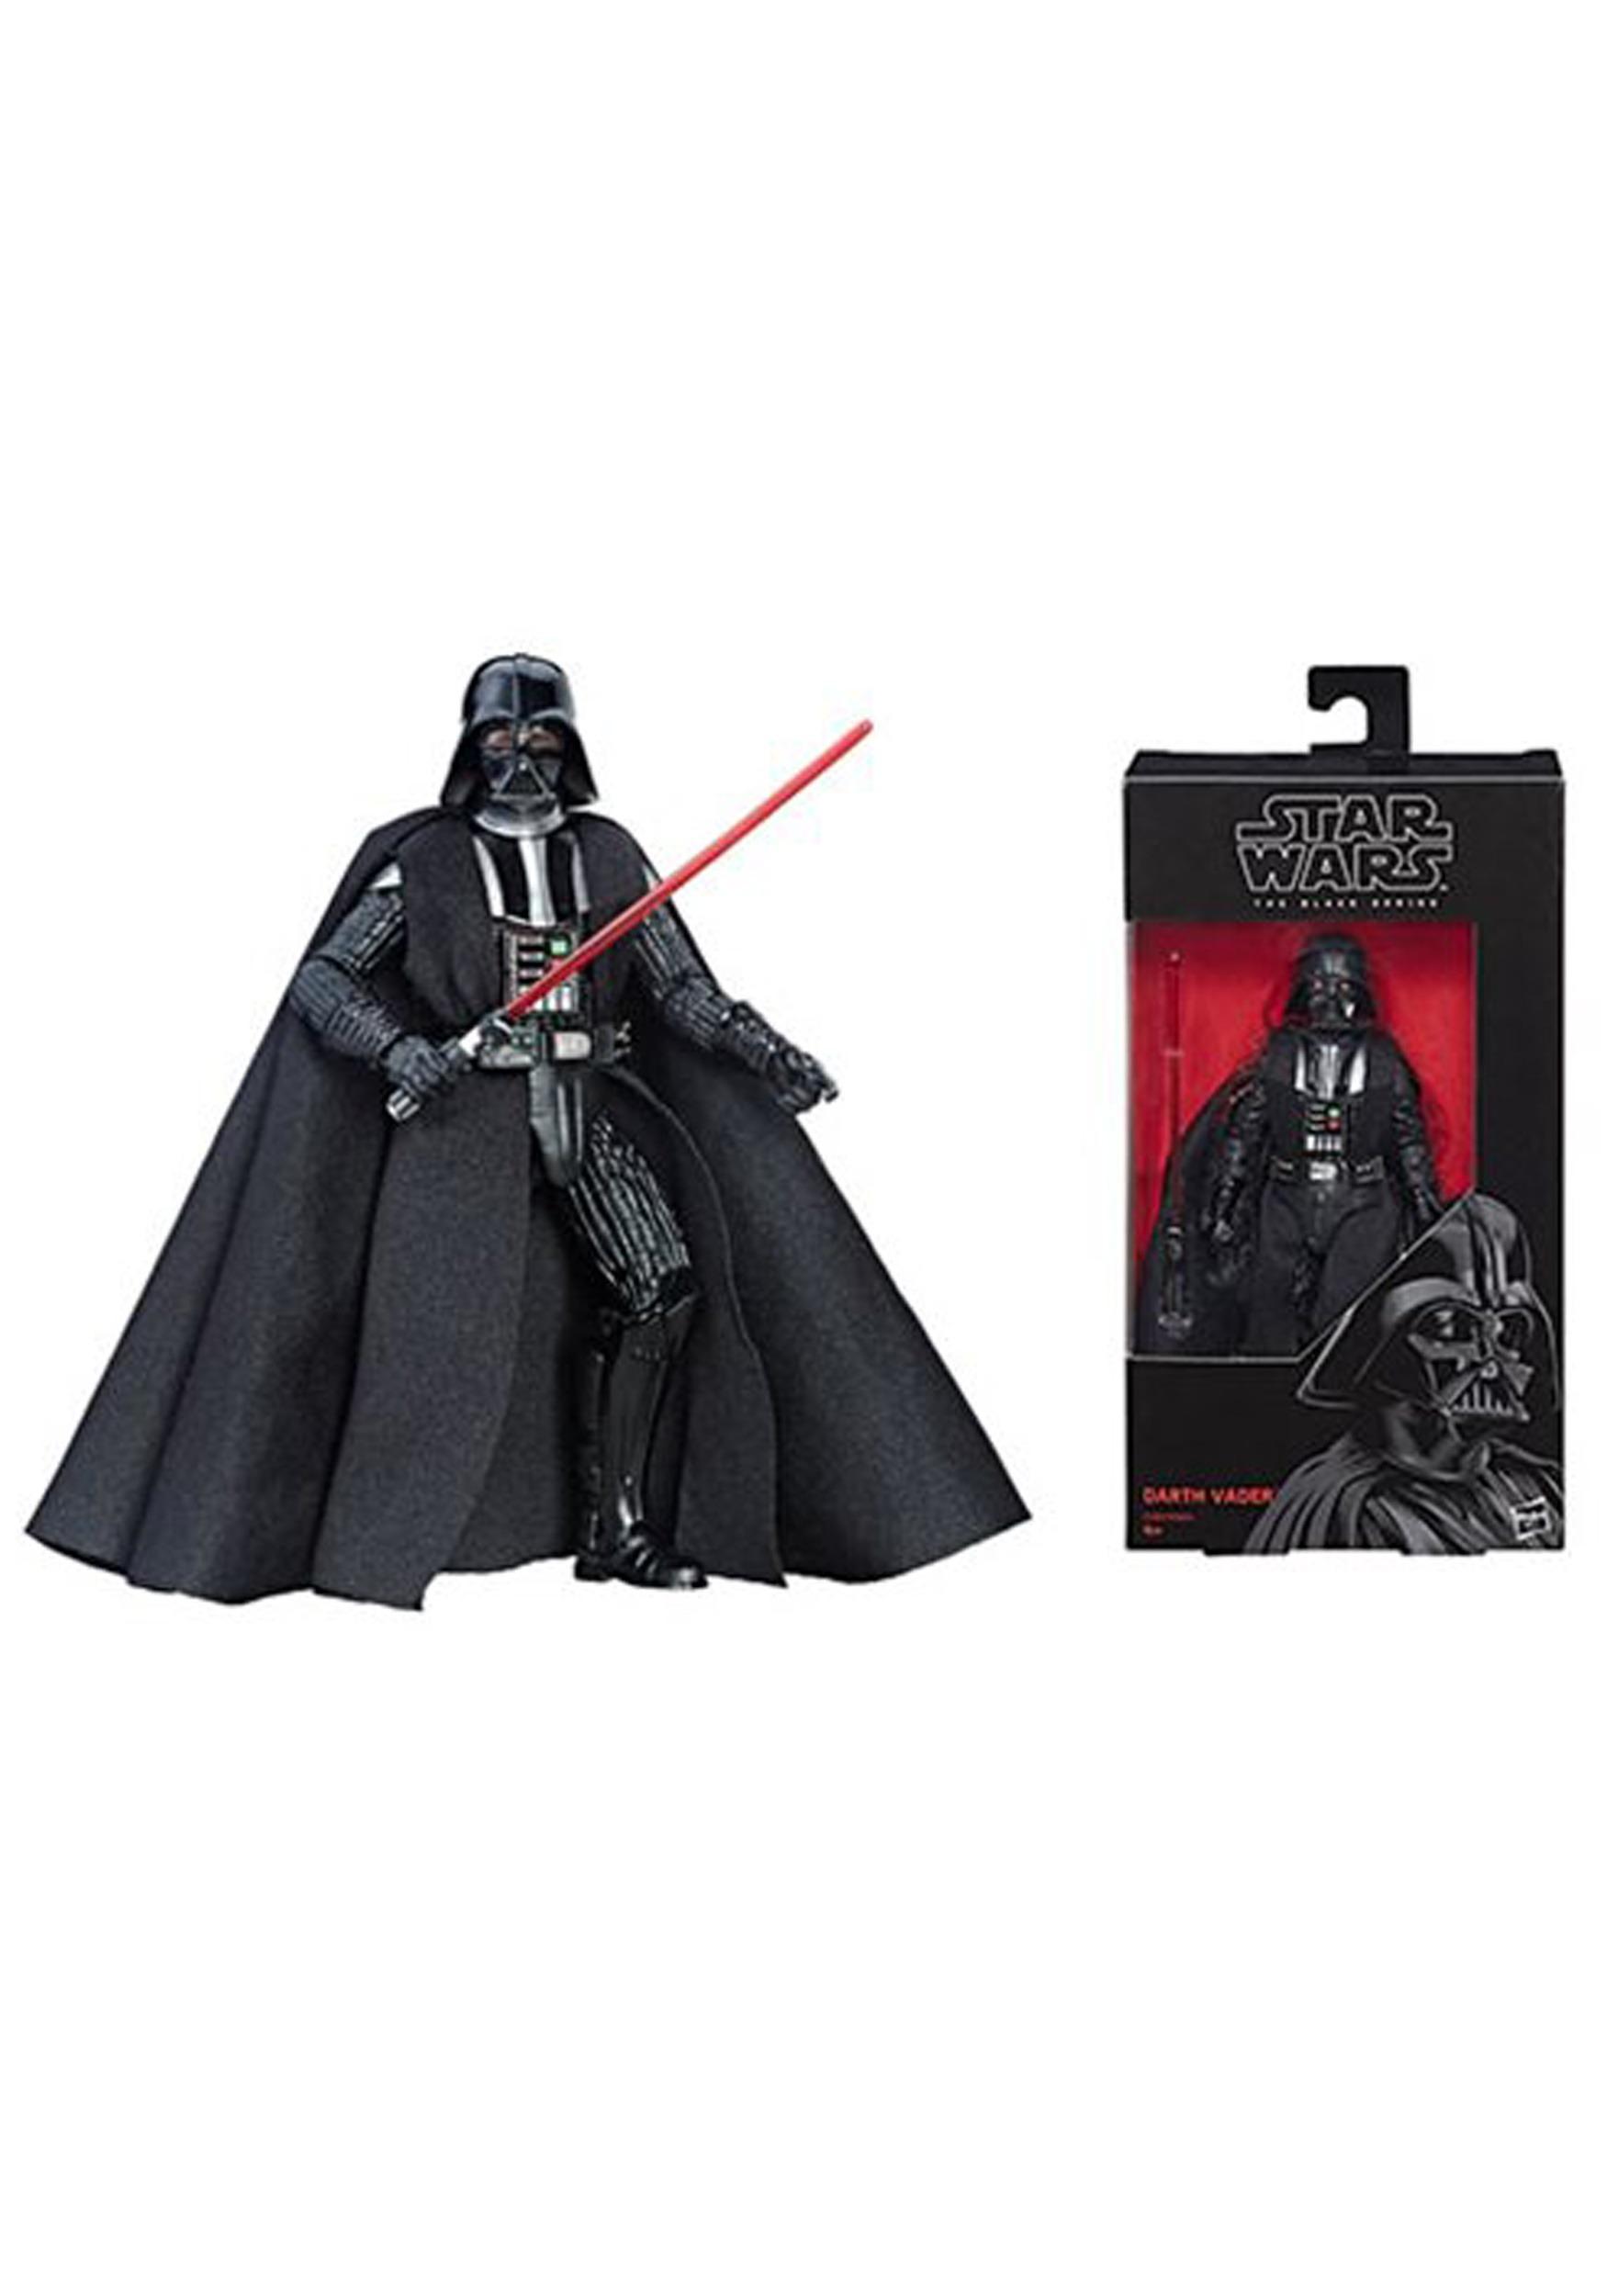 "Star Wars The Black Series Darth Vader 6"" Action Figure EEDHSC1367"